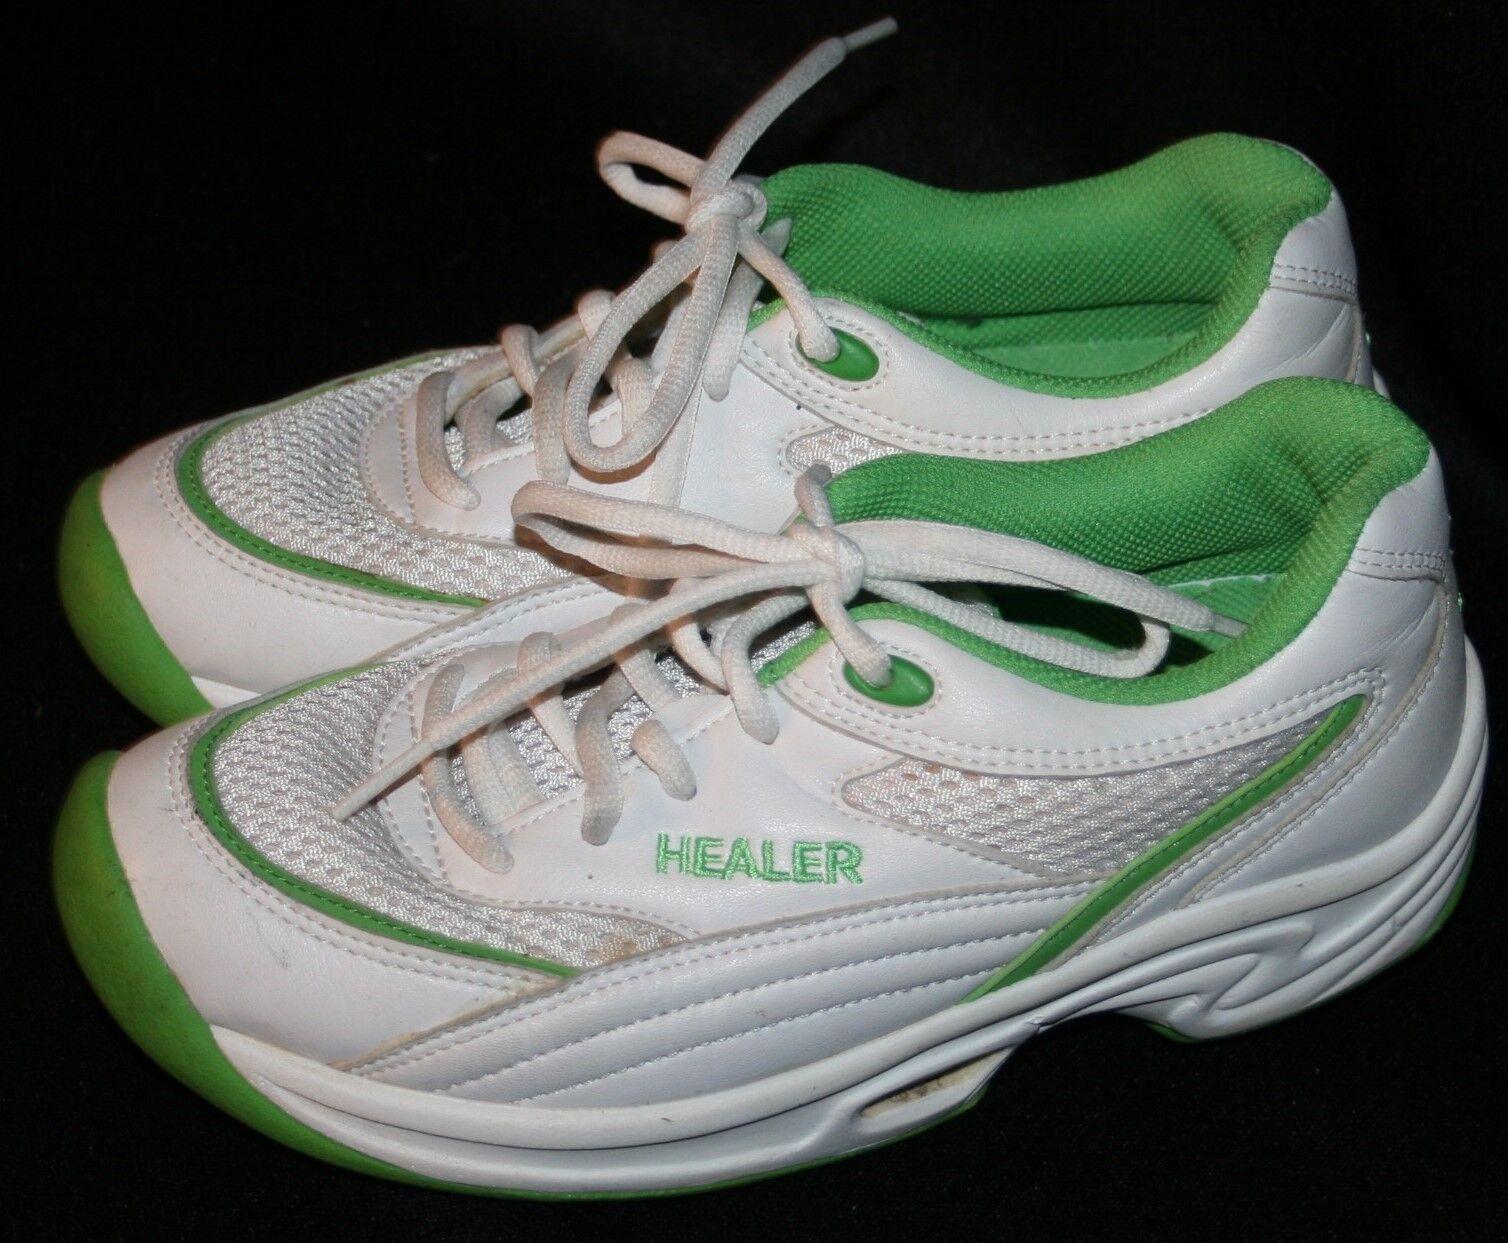 Healer Baskets chaussures Athlétisme 6 Coréen blanc vert Marche Raffermissehommest